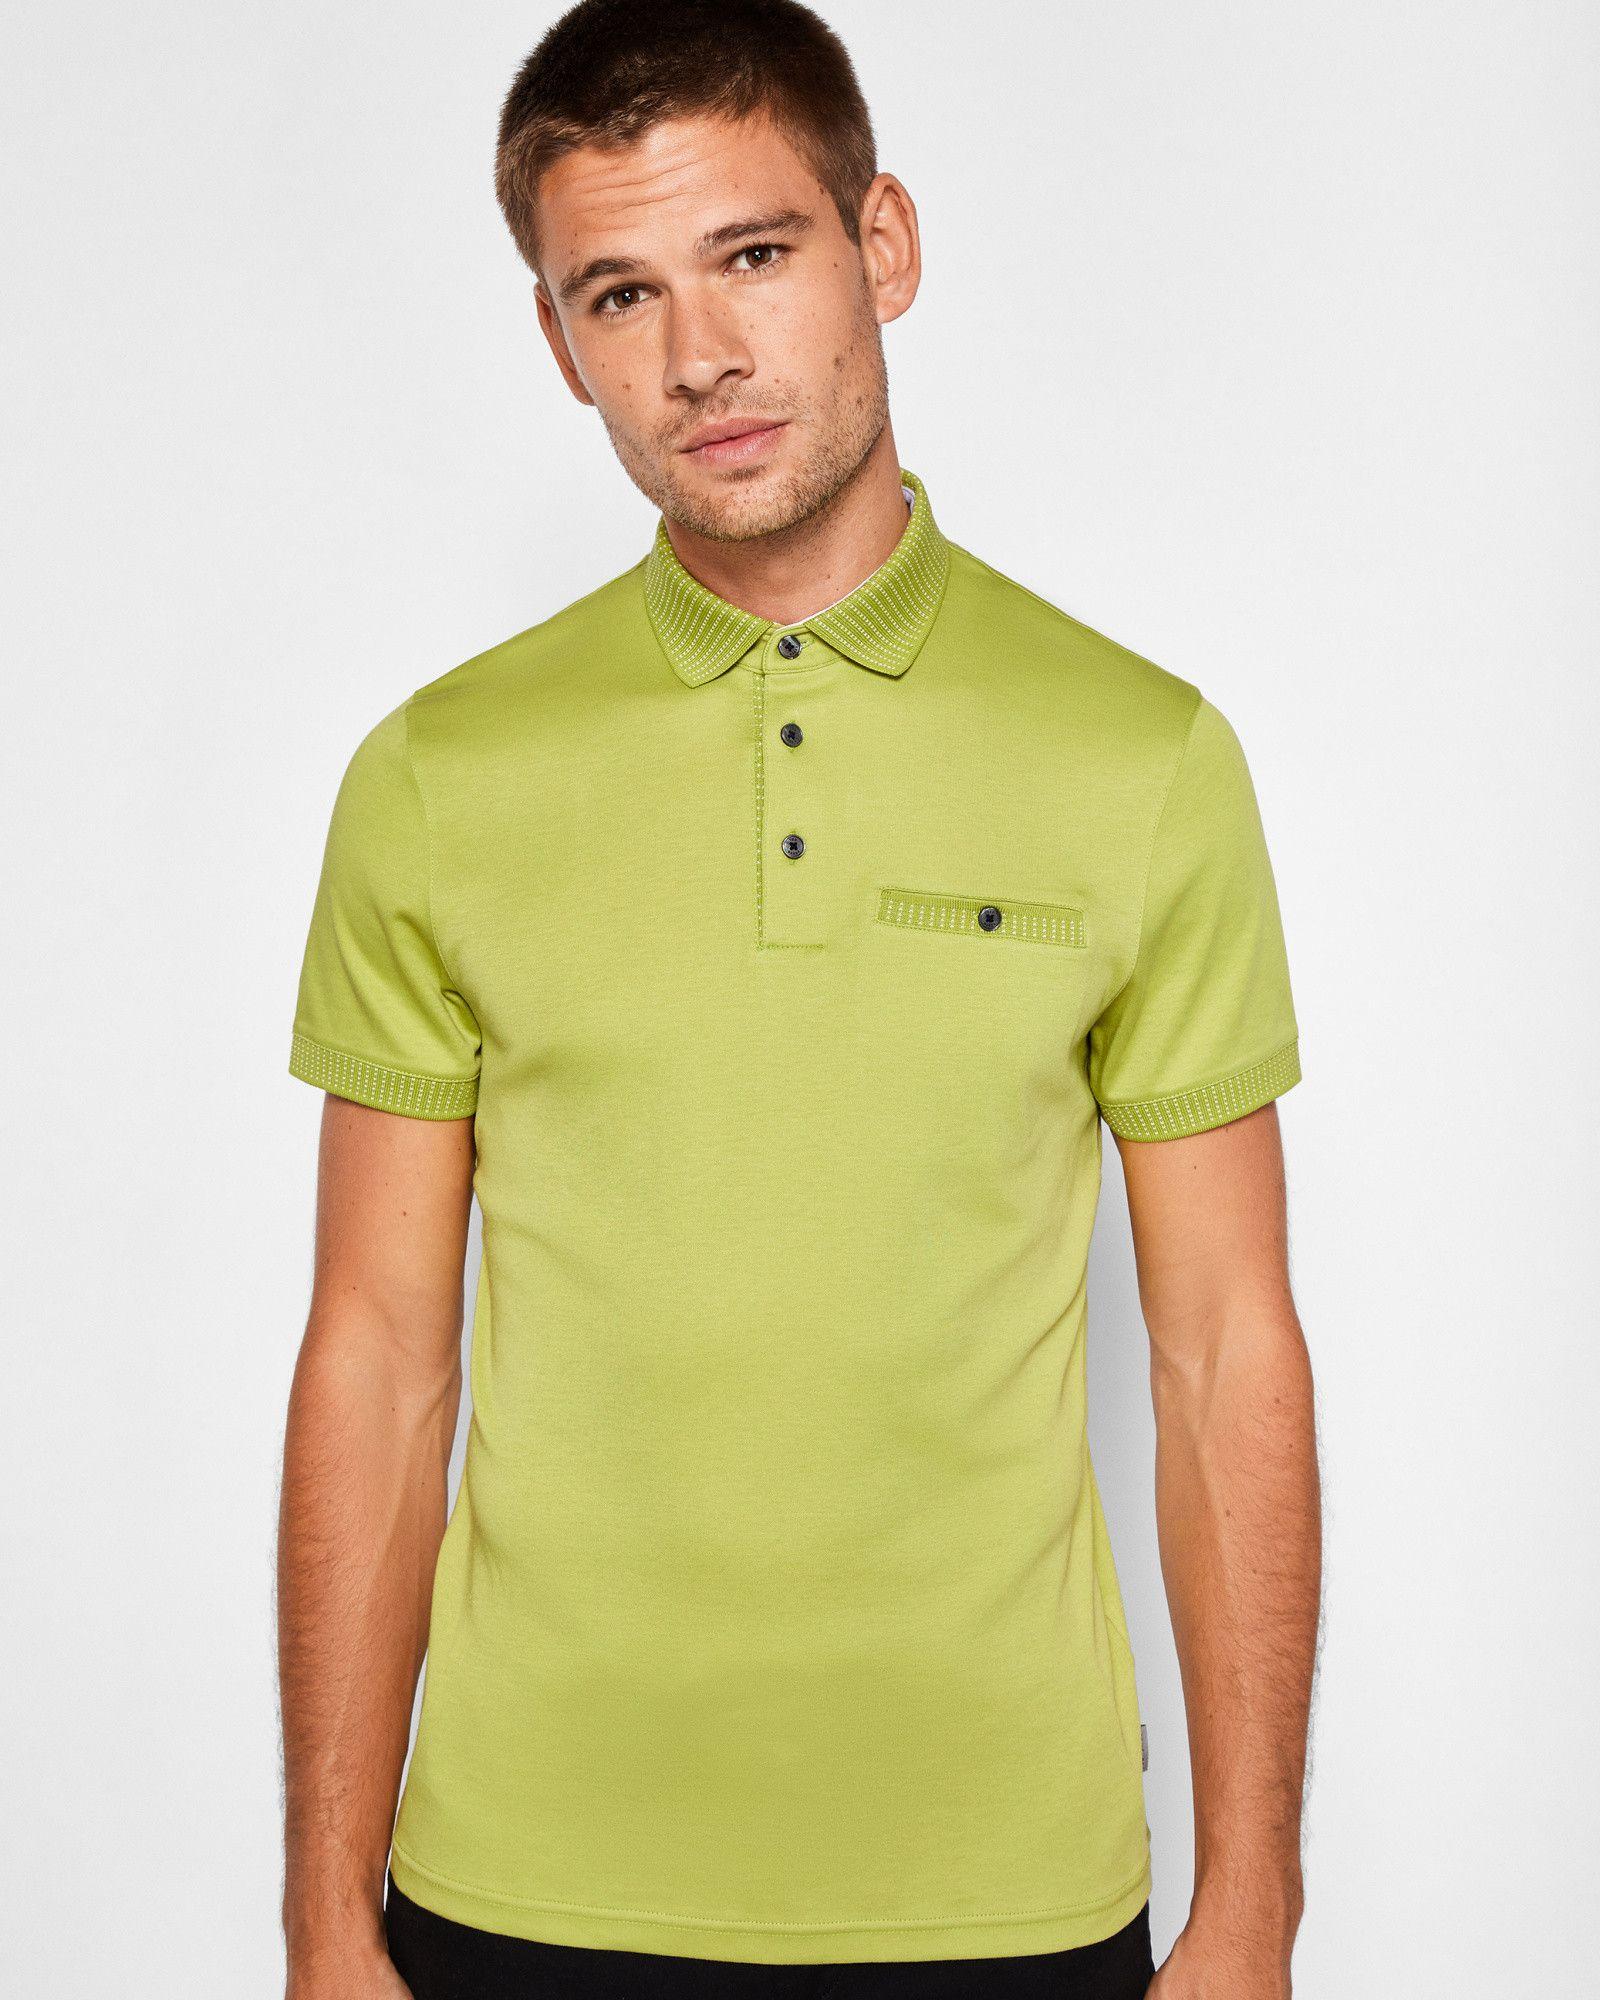 6d8de9906d91ad Ted Baker Flat knit collar cotton polo shirt Lime